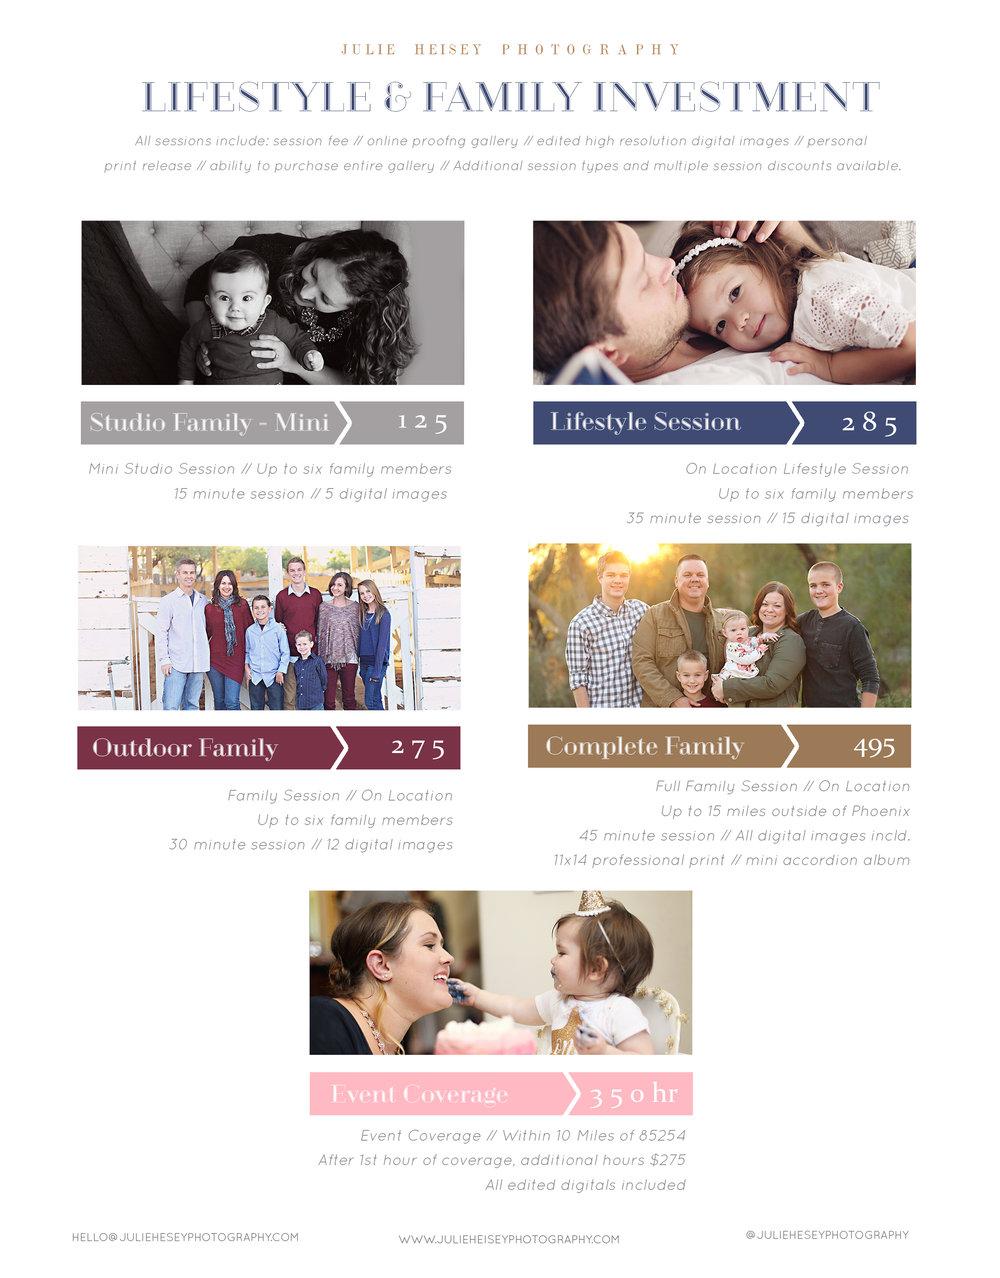 Lifestyle & Family Investment Edit 1 JPEG.jpg